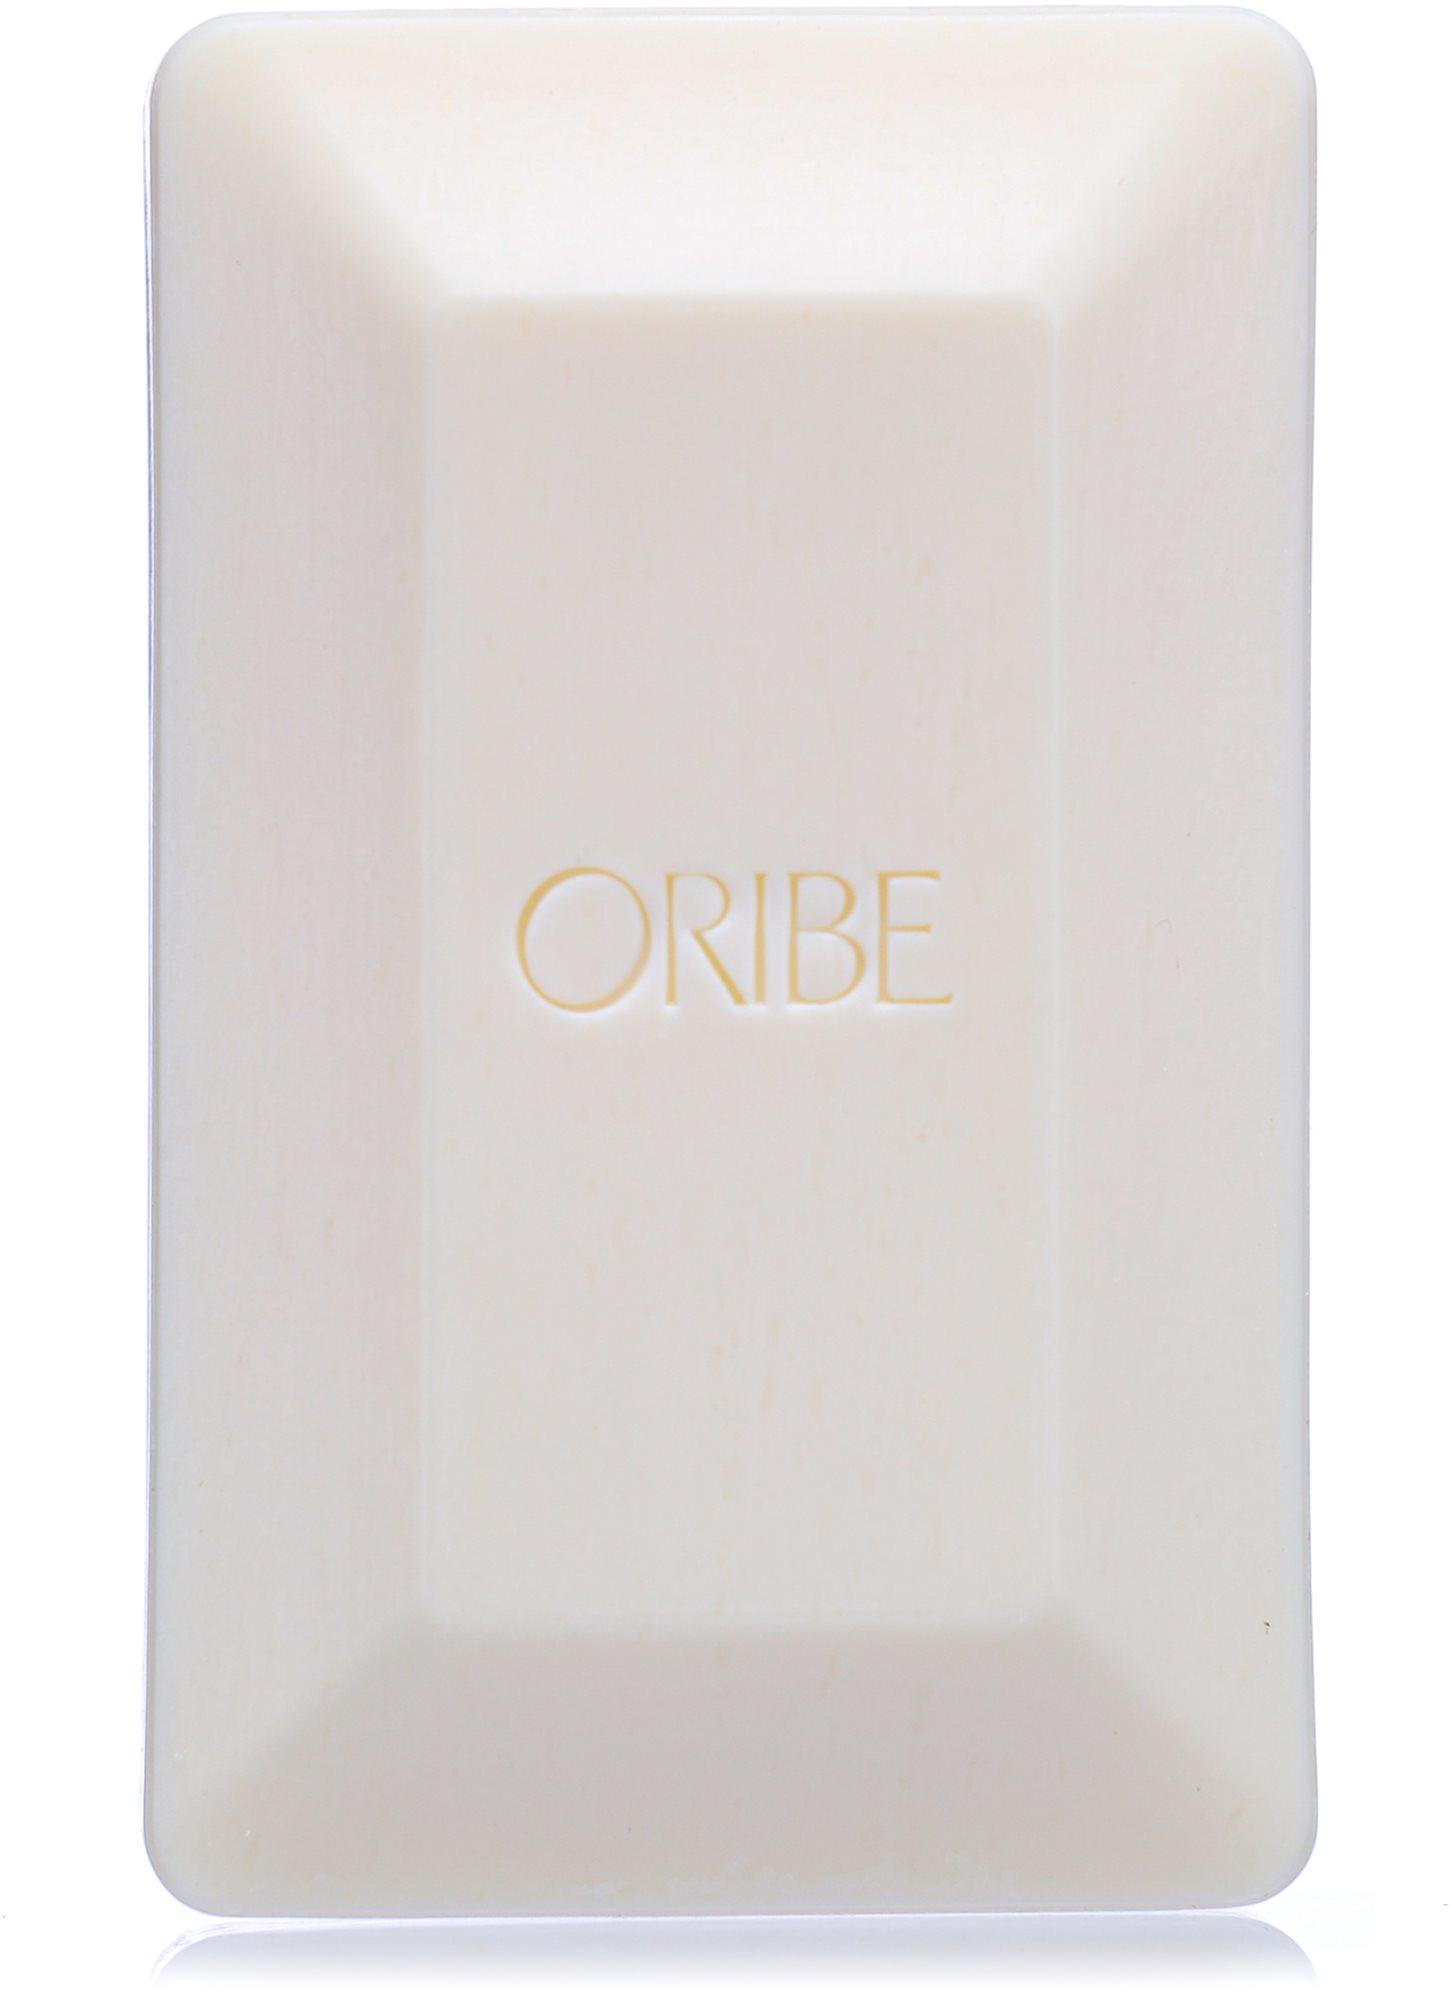 ORIBE Côte d'Azur Bar szappan 198 g